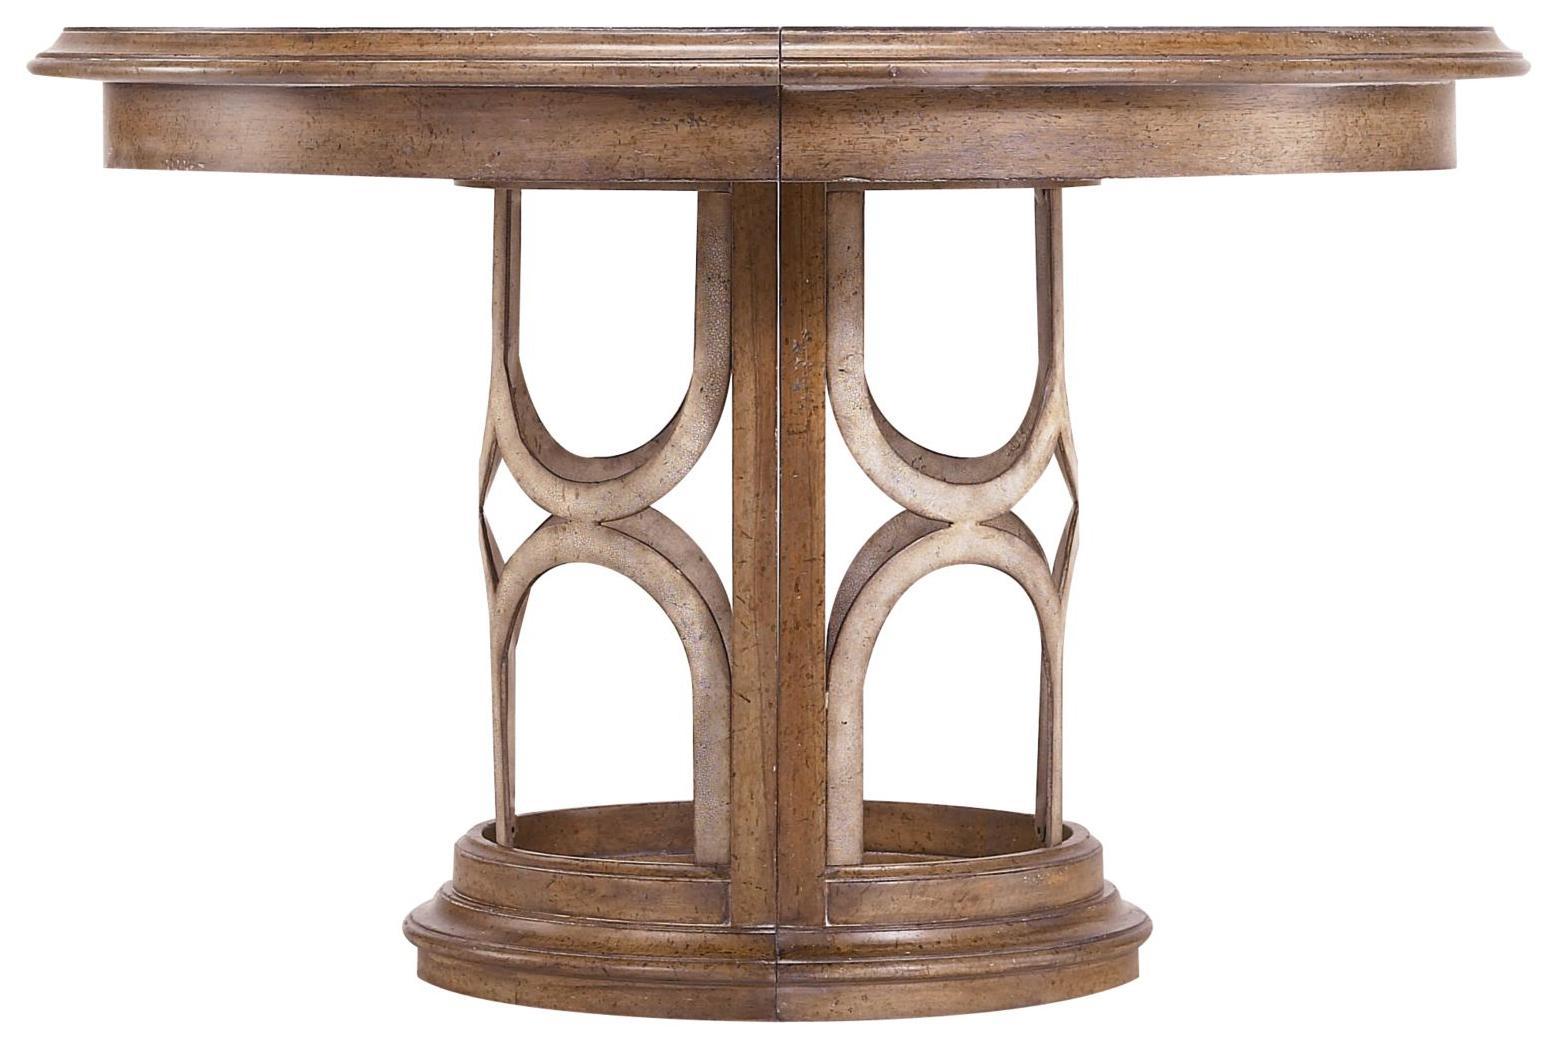 Stanley Furniture Archipelago Monserrat Round Pedestal Table - Item Number: 186-61-30